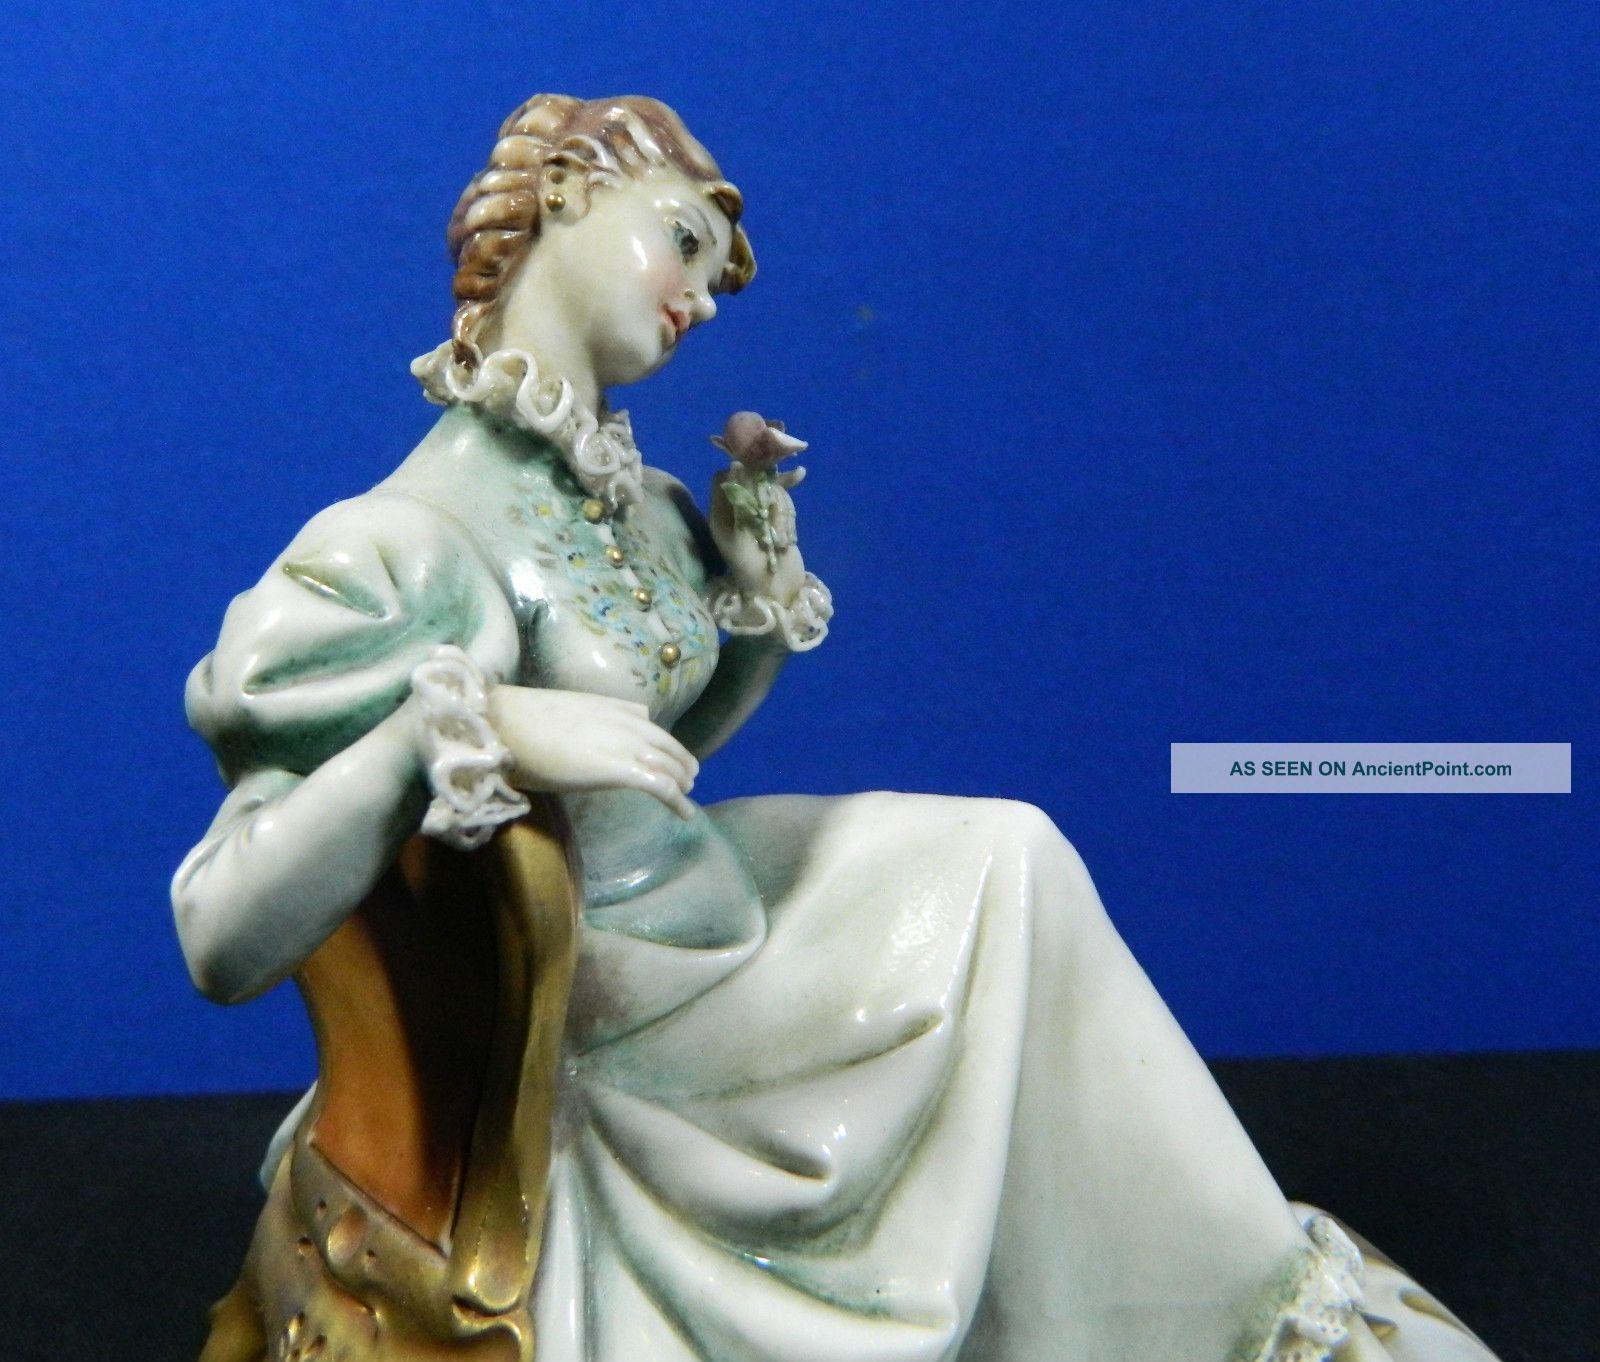 Borsato Hand Painted Porcelain Figurine Italy Vintage Lady